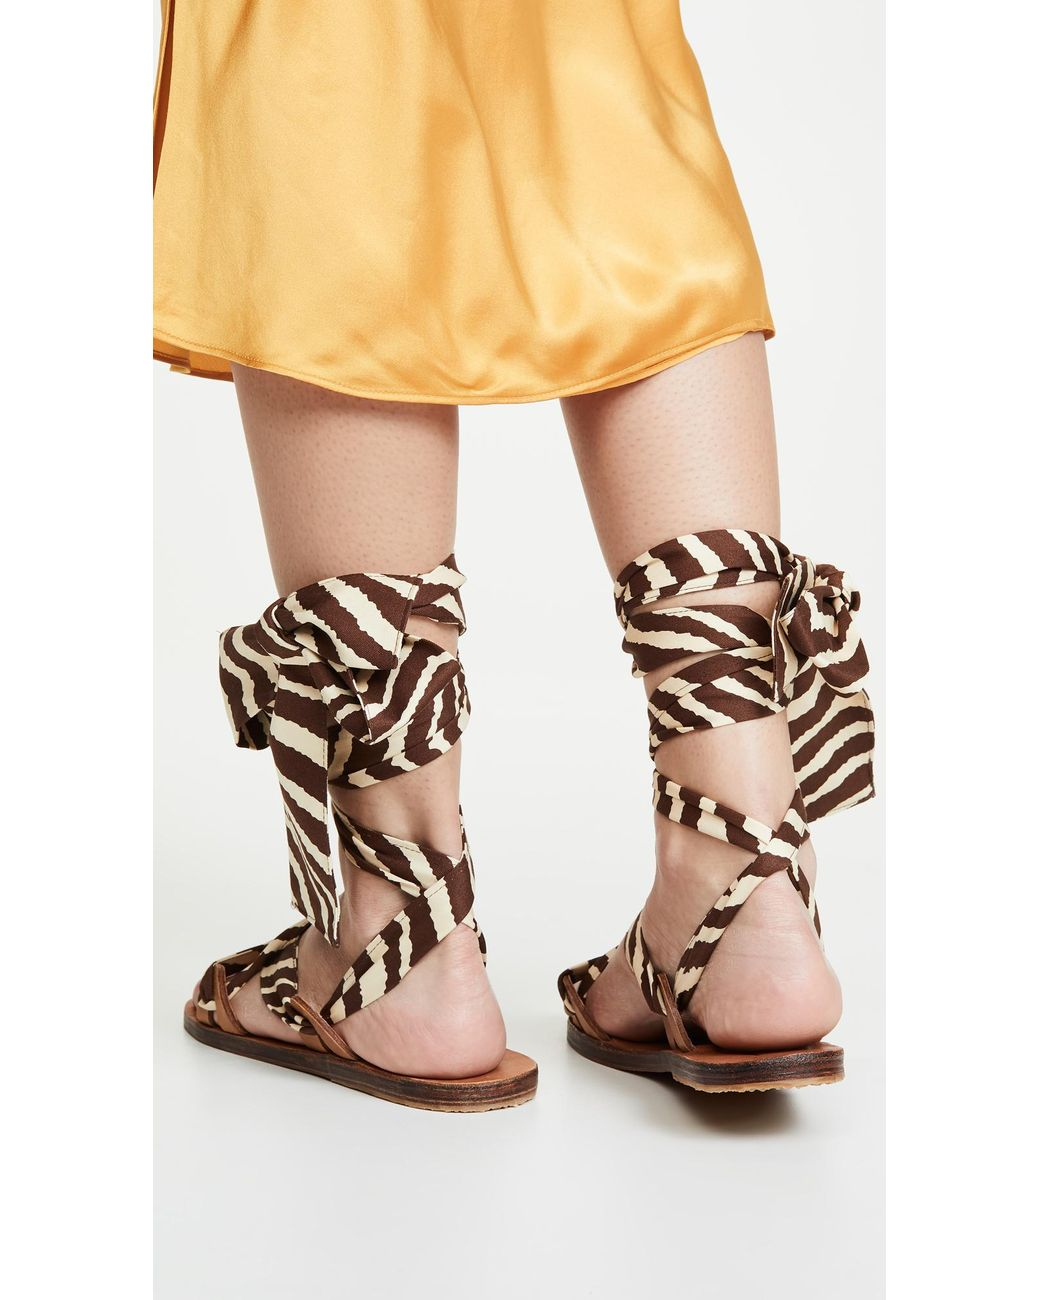 SAM EDELMAN Hampton Snakeskin Print Caged Heels Sandals Beige Jewel Leather $170